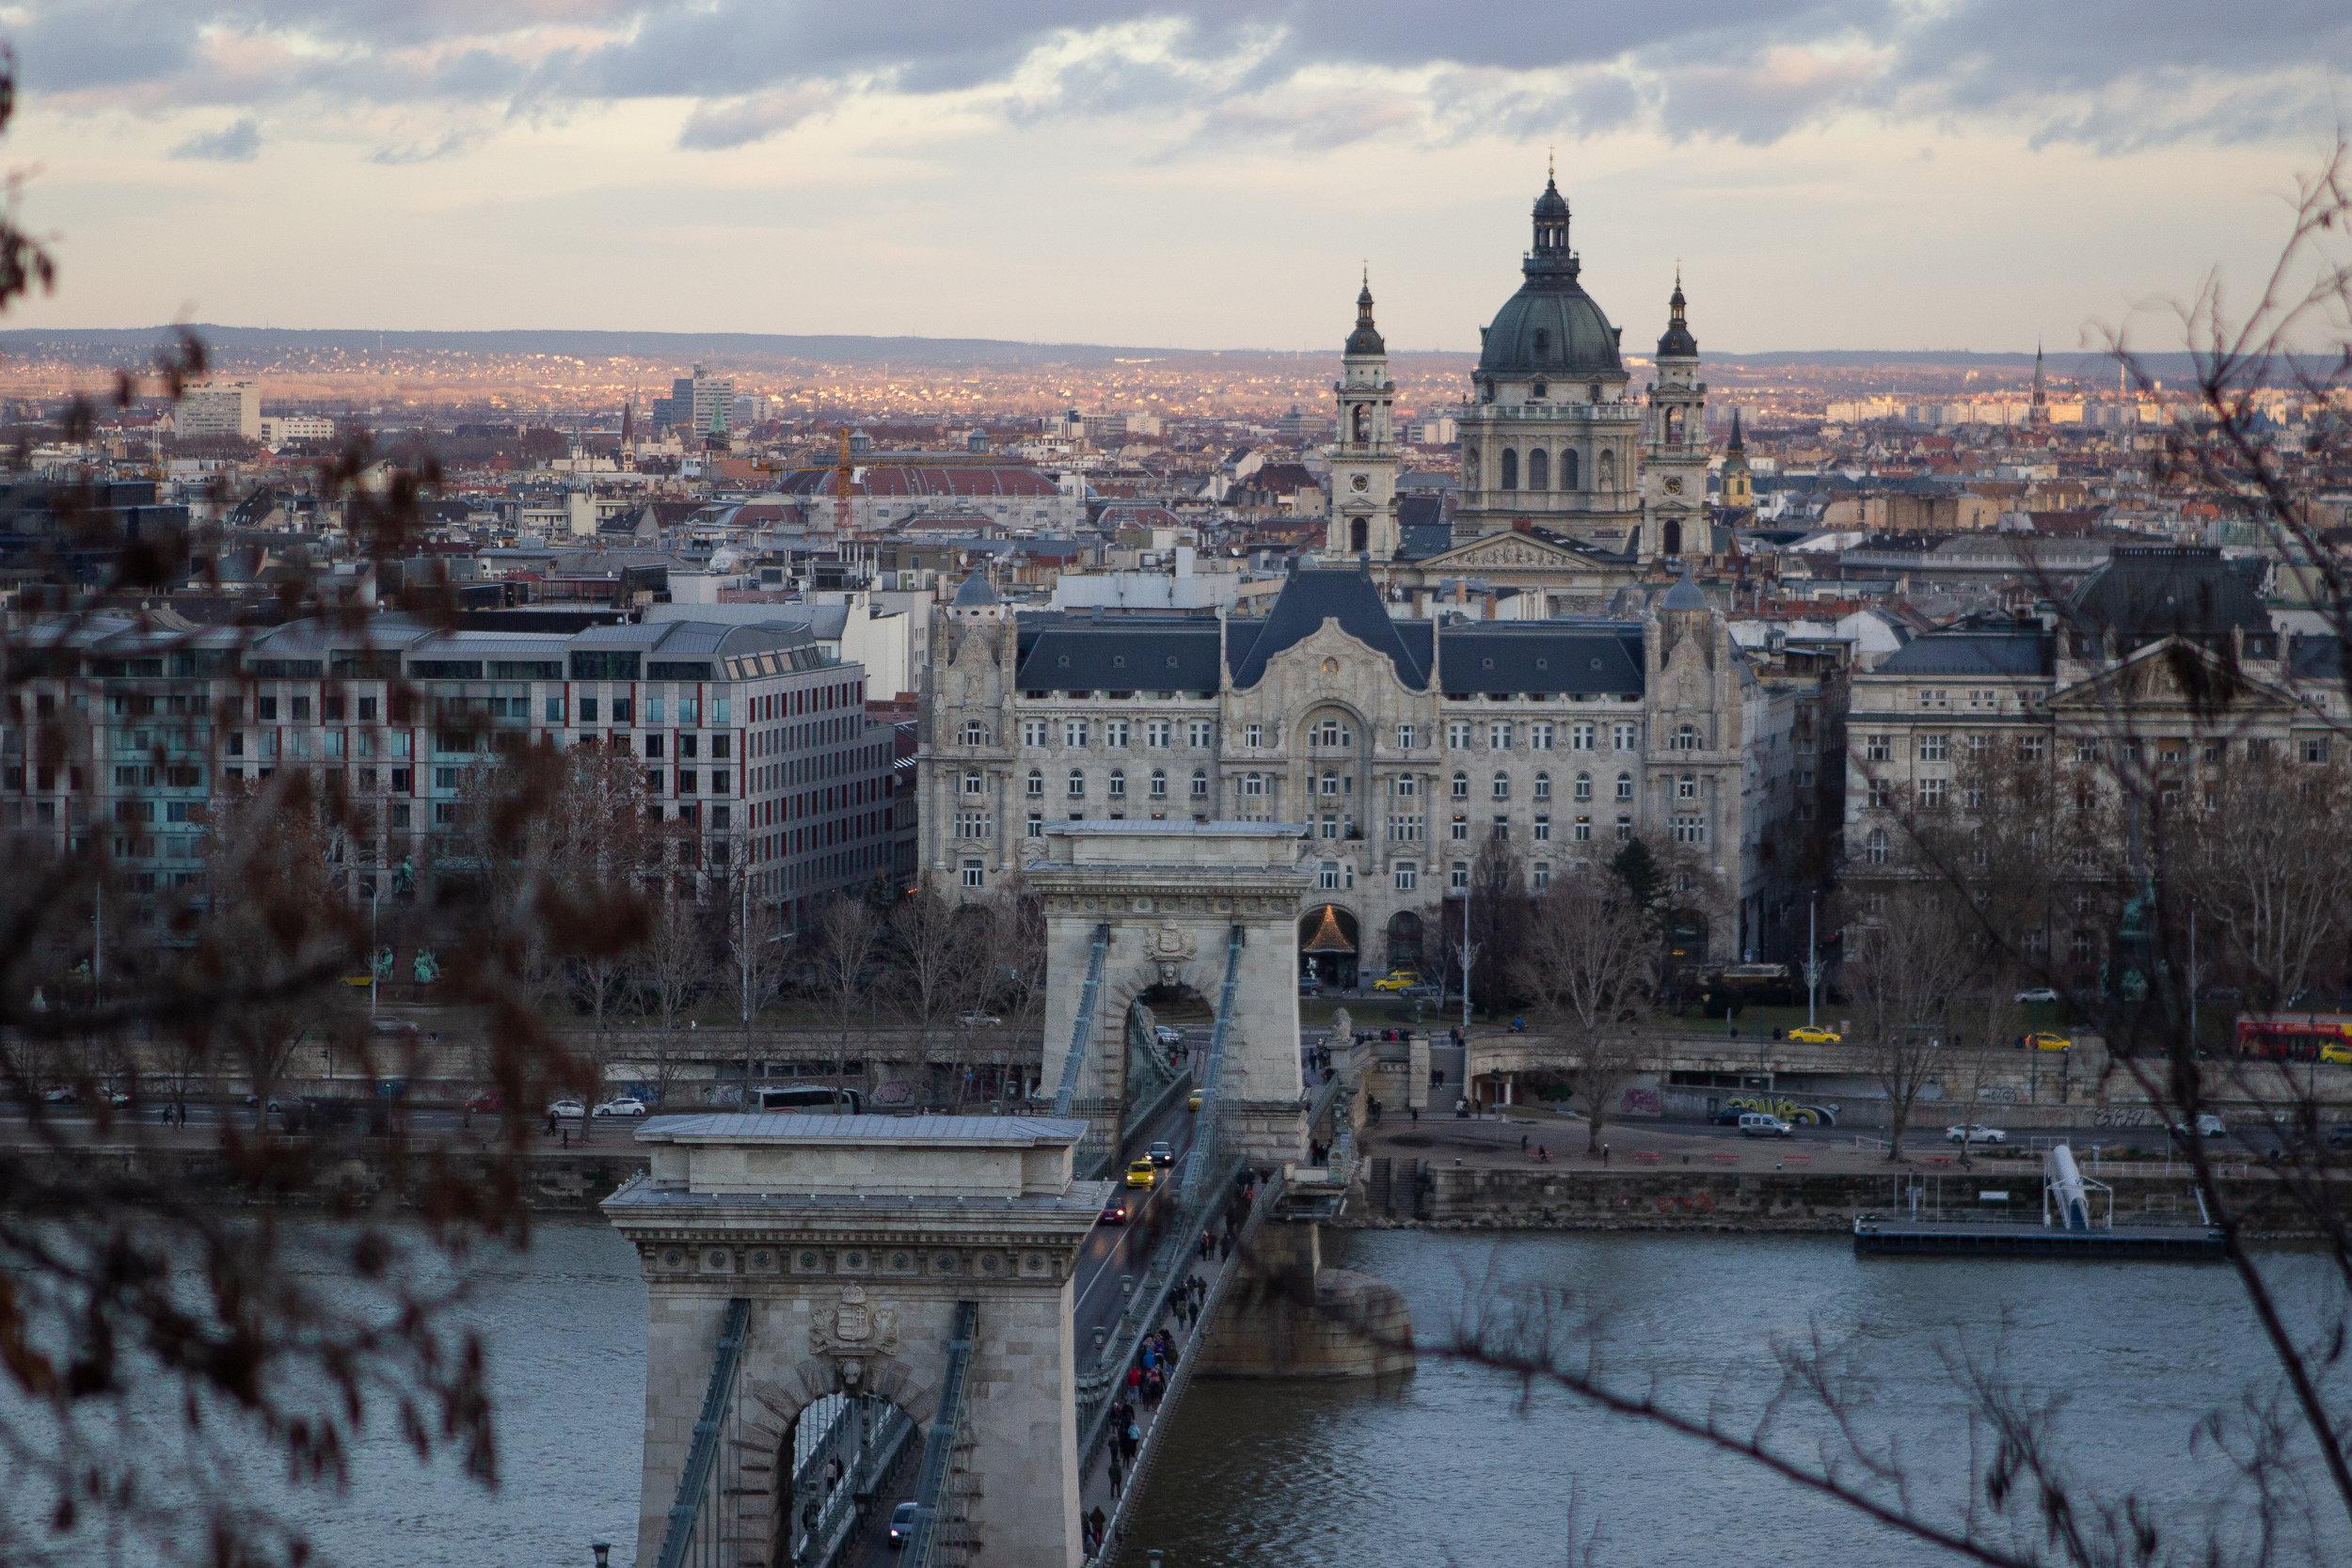 St. Stephen's Dome above the Budapest skyline.